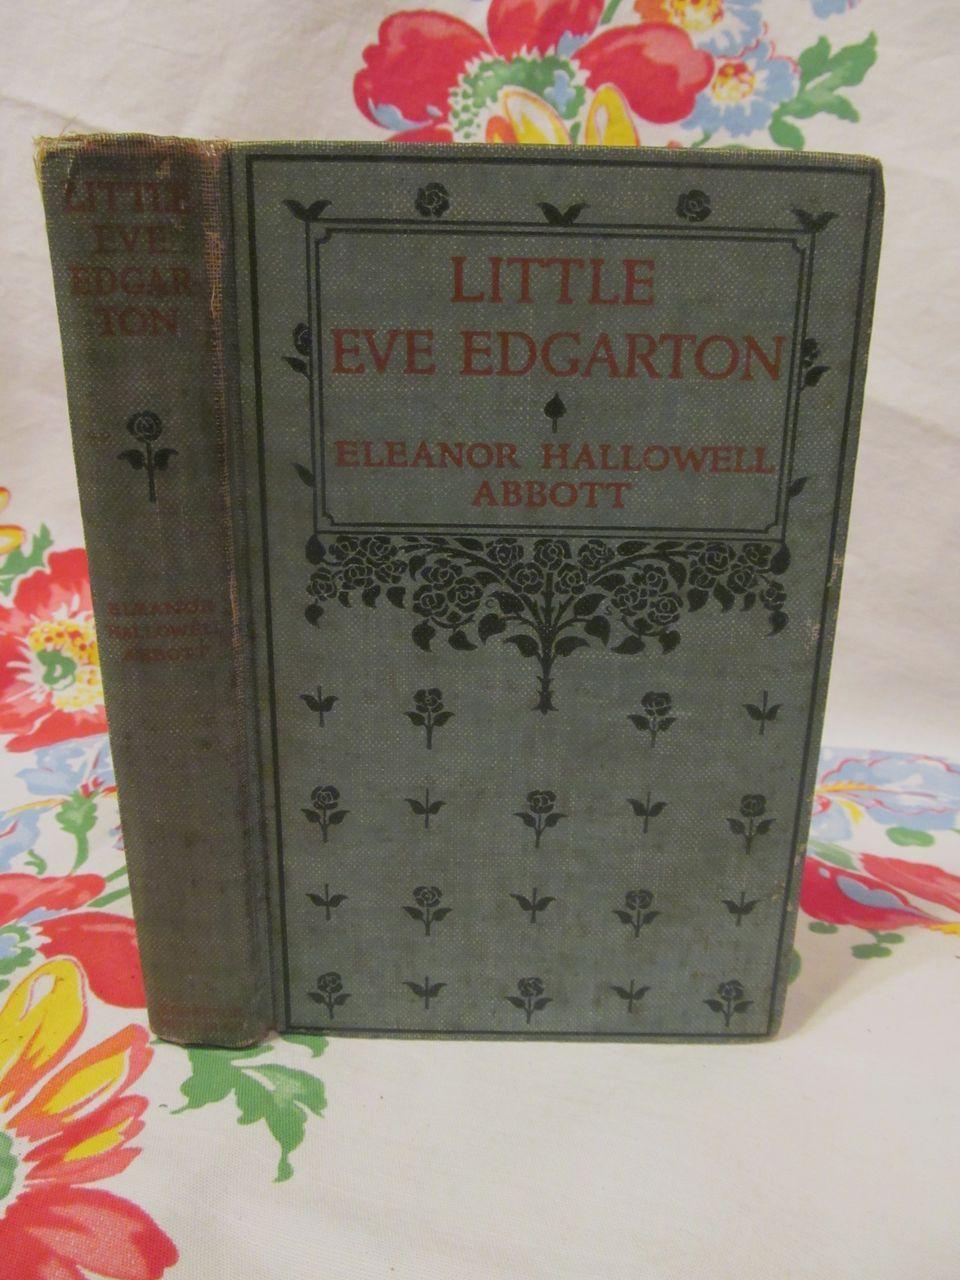 1914 Little Eve Edgarton by Eleanor Hallowell Abbott